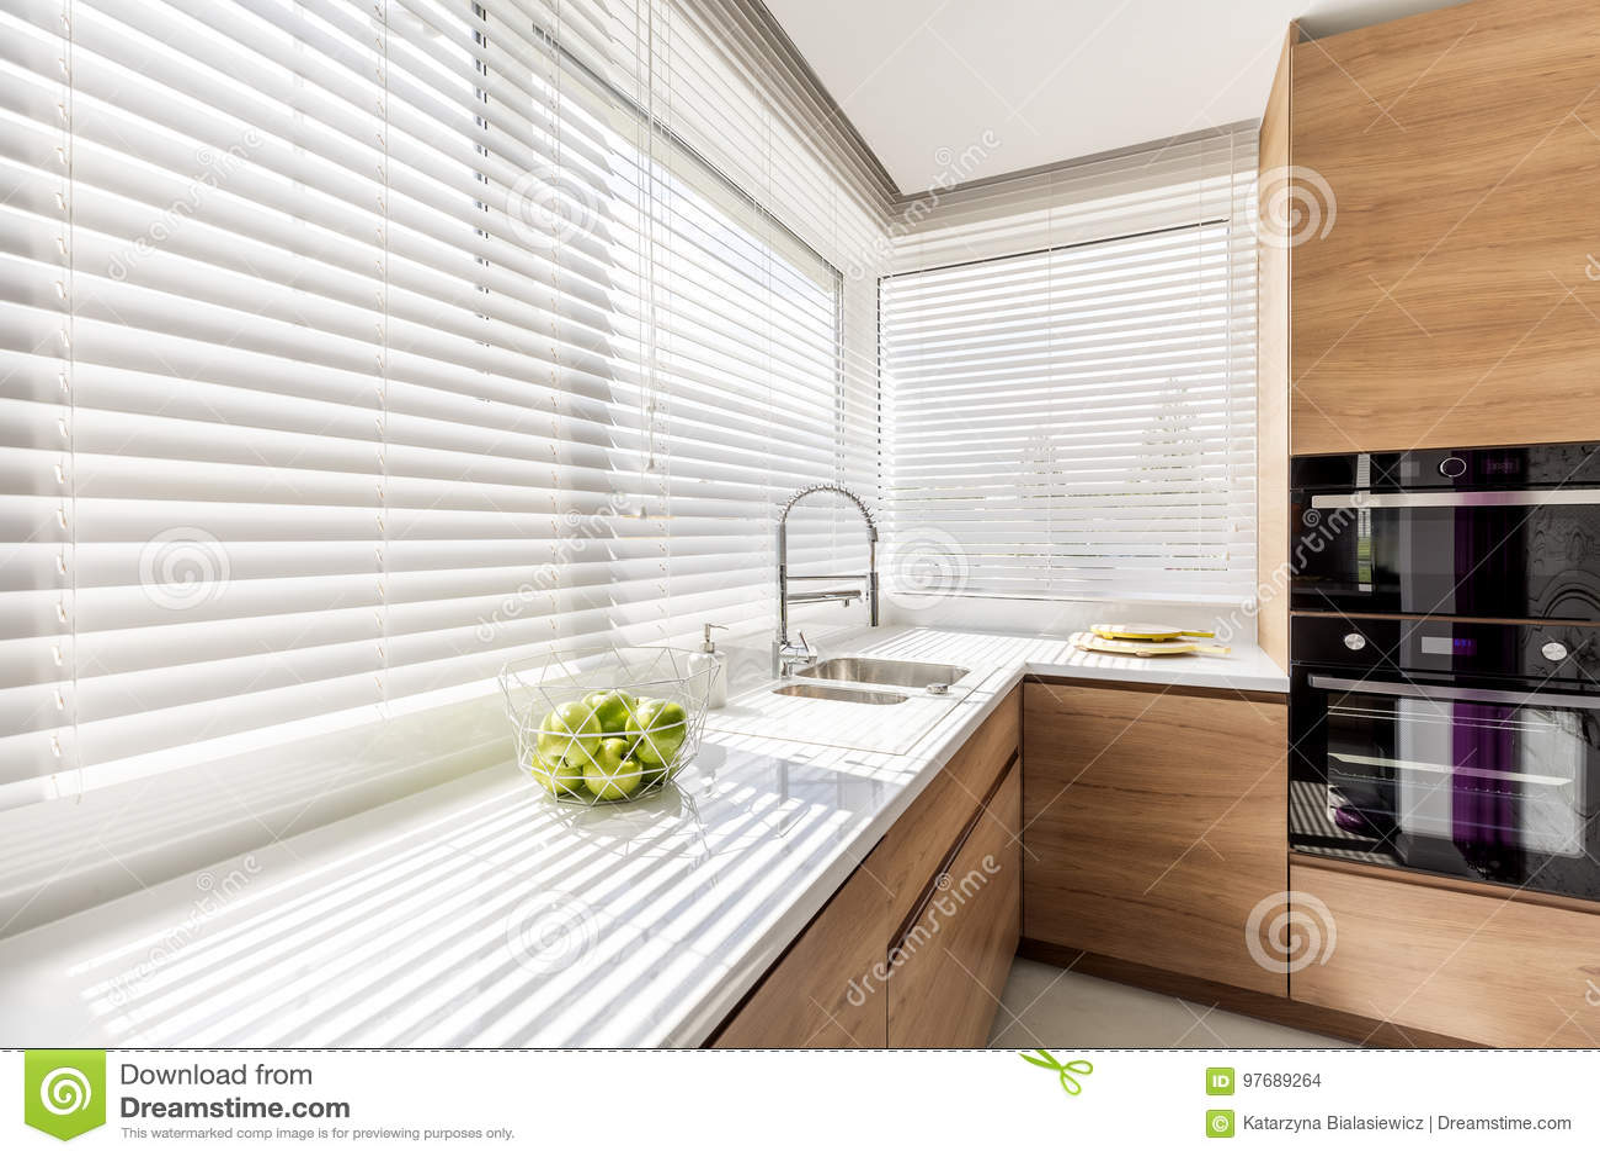 kitchen curtains for sale how to clean grease from cabinets 有白色窗帘的厨房库存照片 图片包括有装饰 分配器 申请人 设计 想法 与白色水平的窗帘的现代明亮的厨房内部 有白色工作台面的木内阁和家用电器